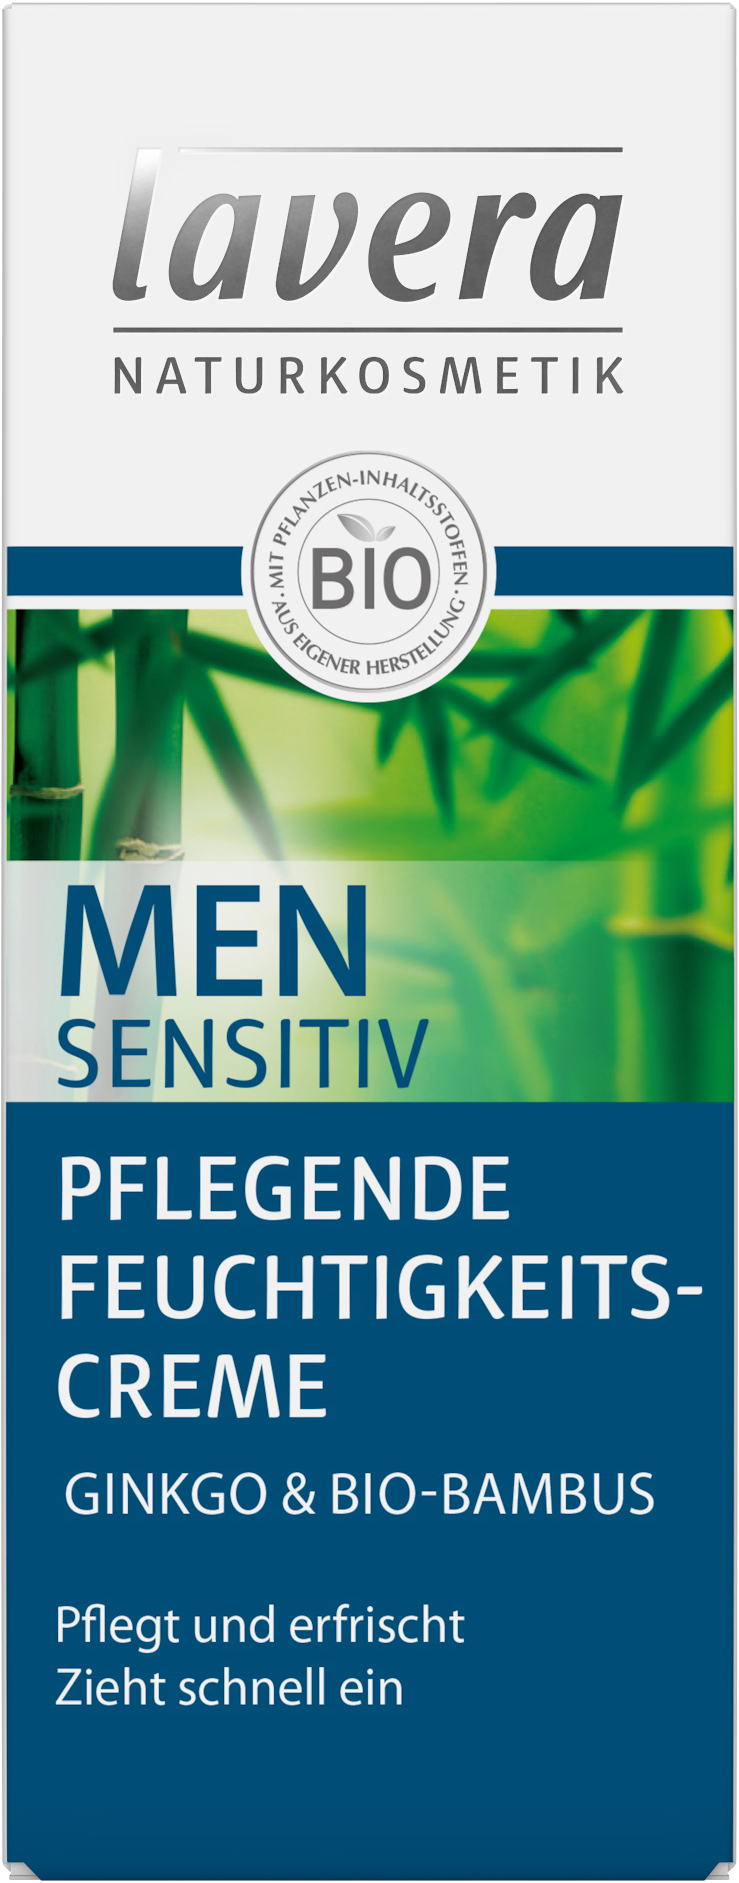 Men Sensitiv Pflegende Feuchtigkeitscreme